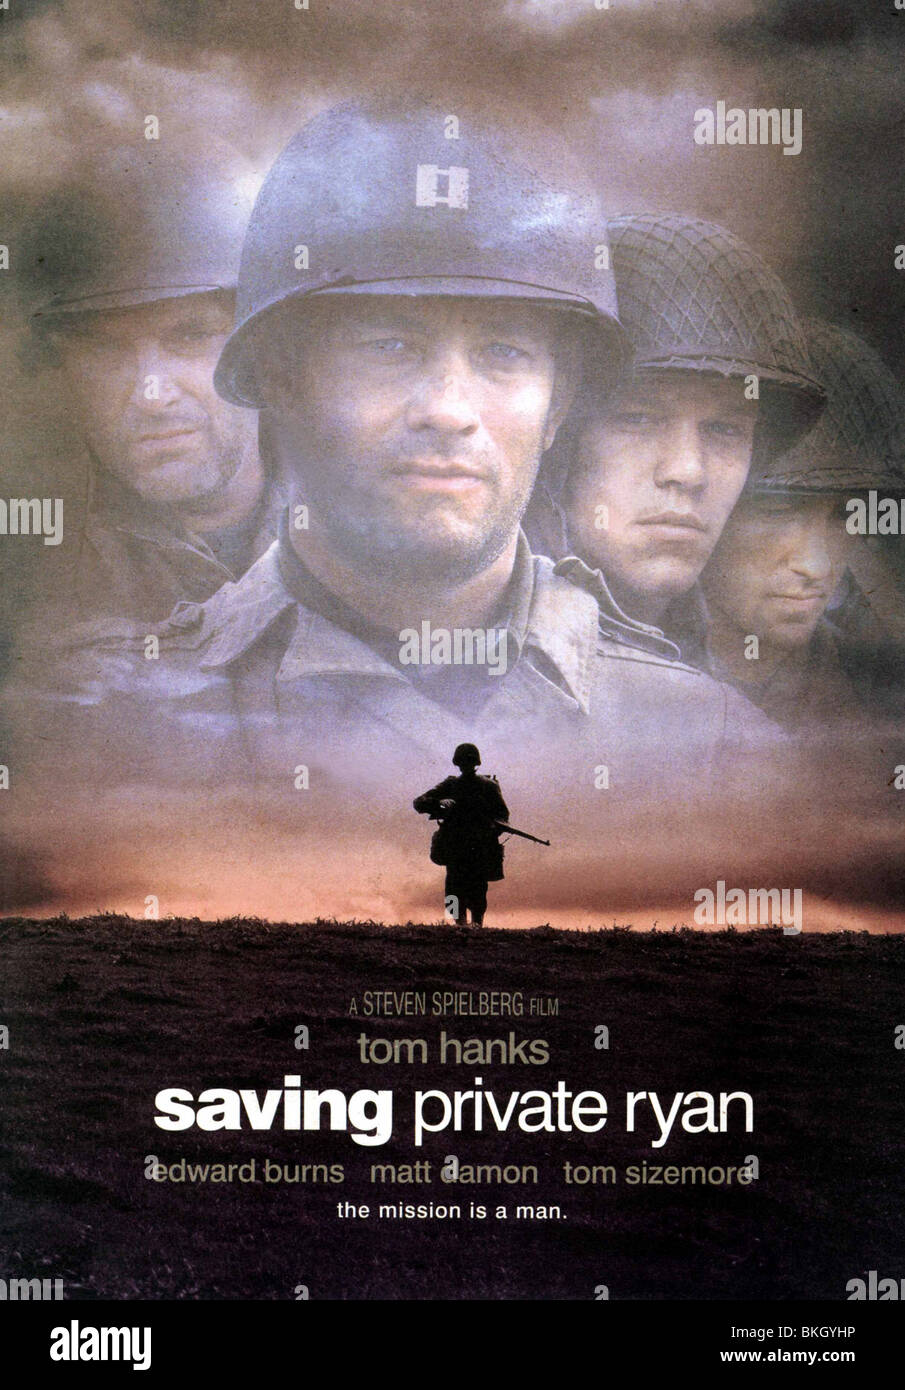 Saving Private Ryan 1998 Poster Sapr 001pp Stock Photo Alamy